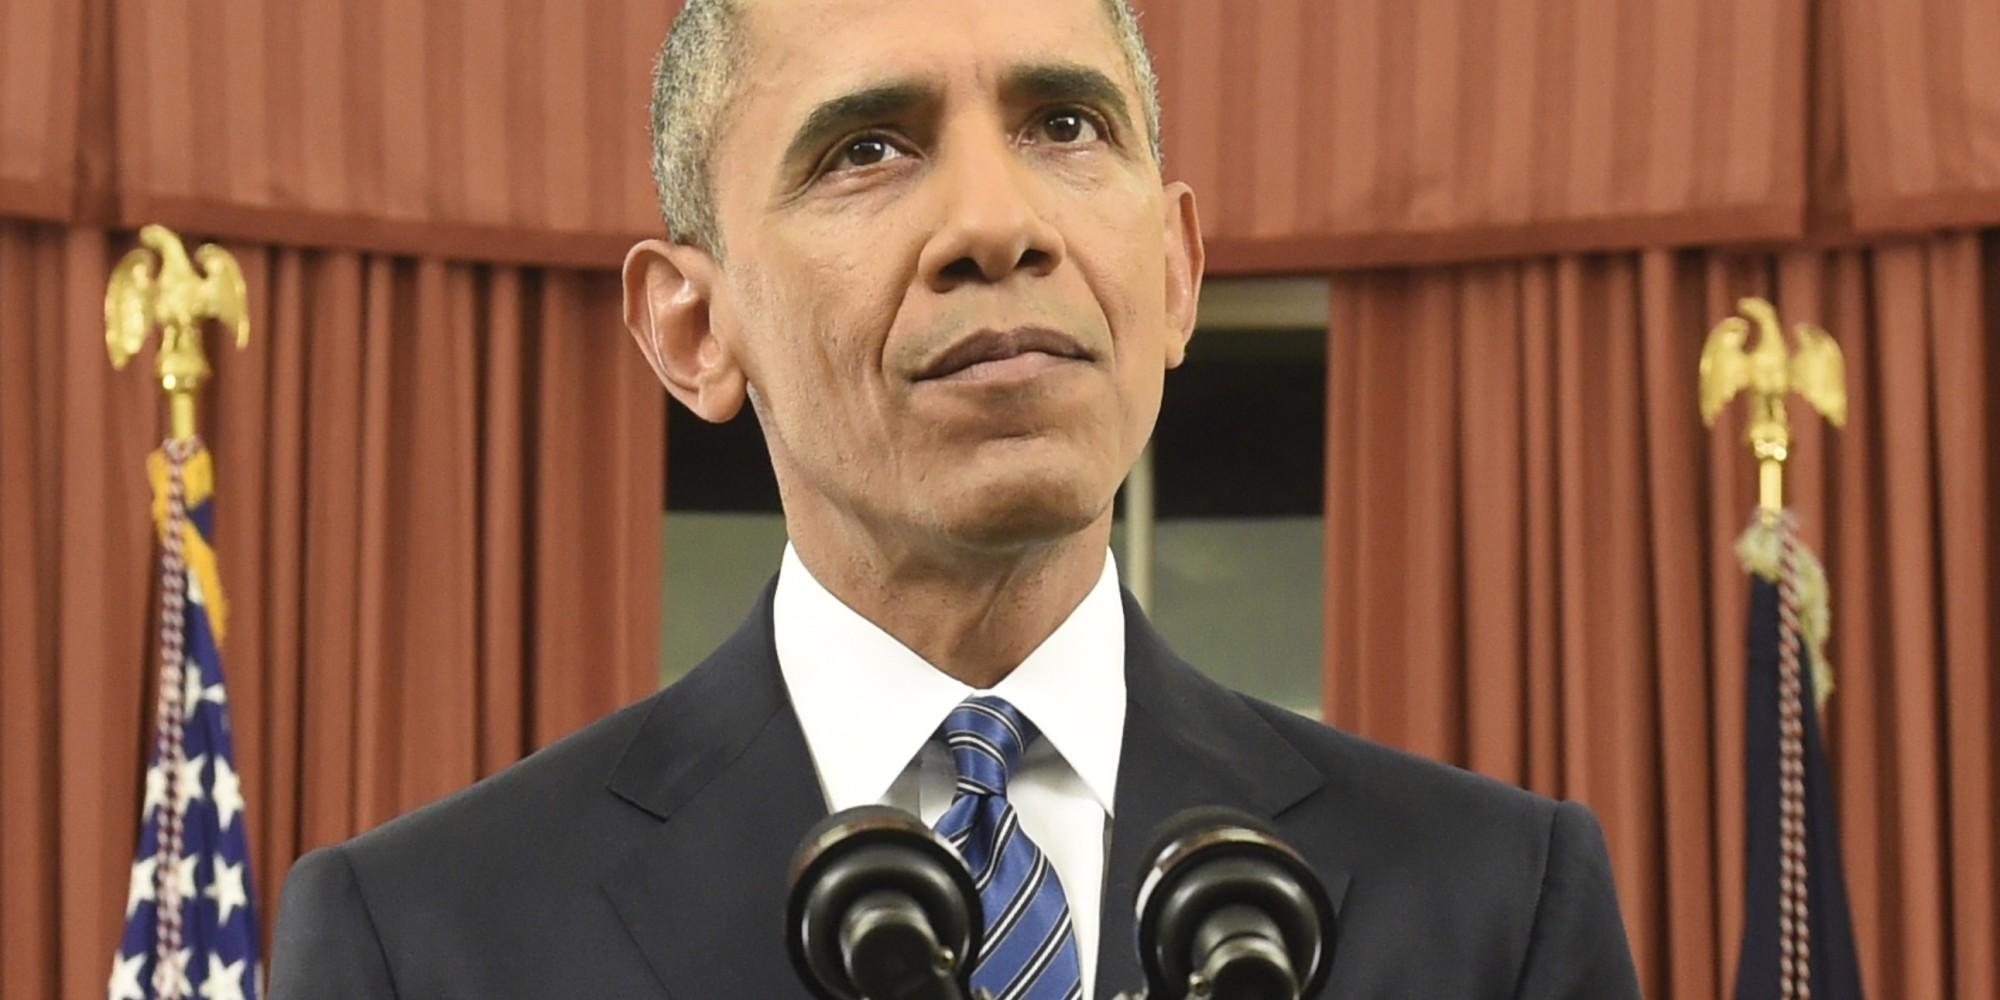 In Fighting Terror, We Need More Mr. President   HuffPost